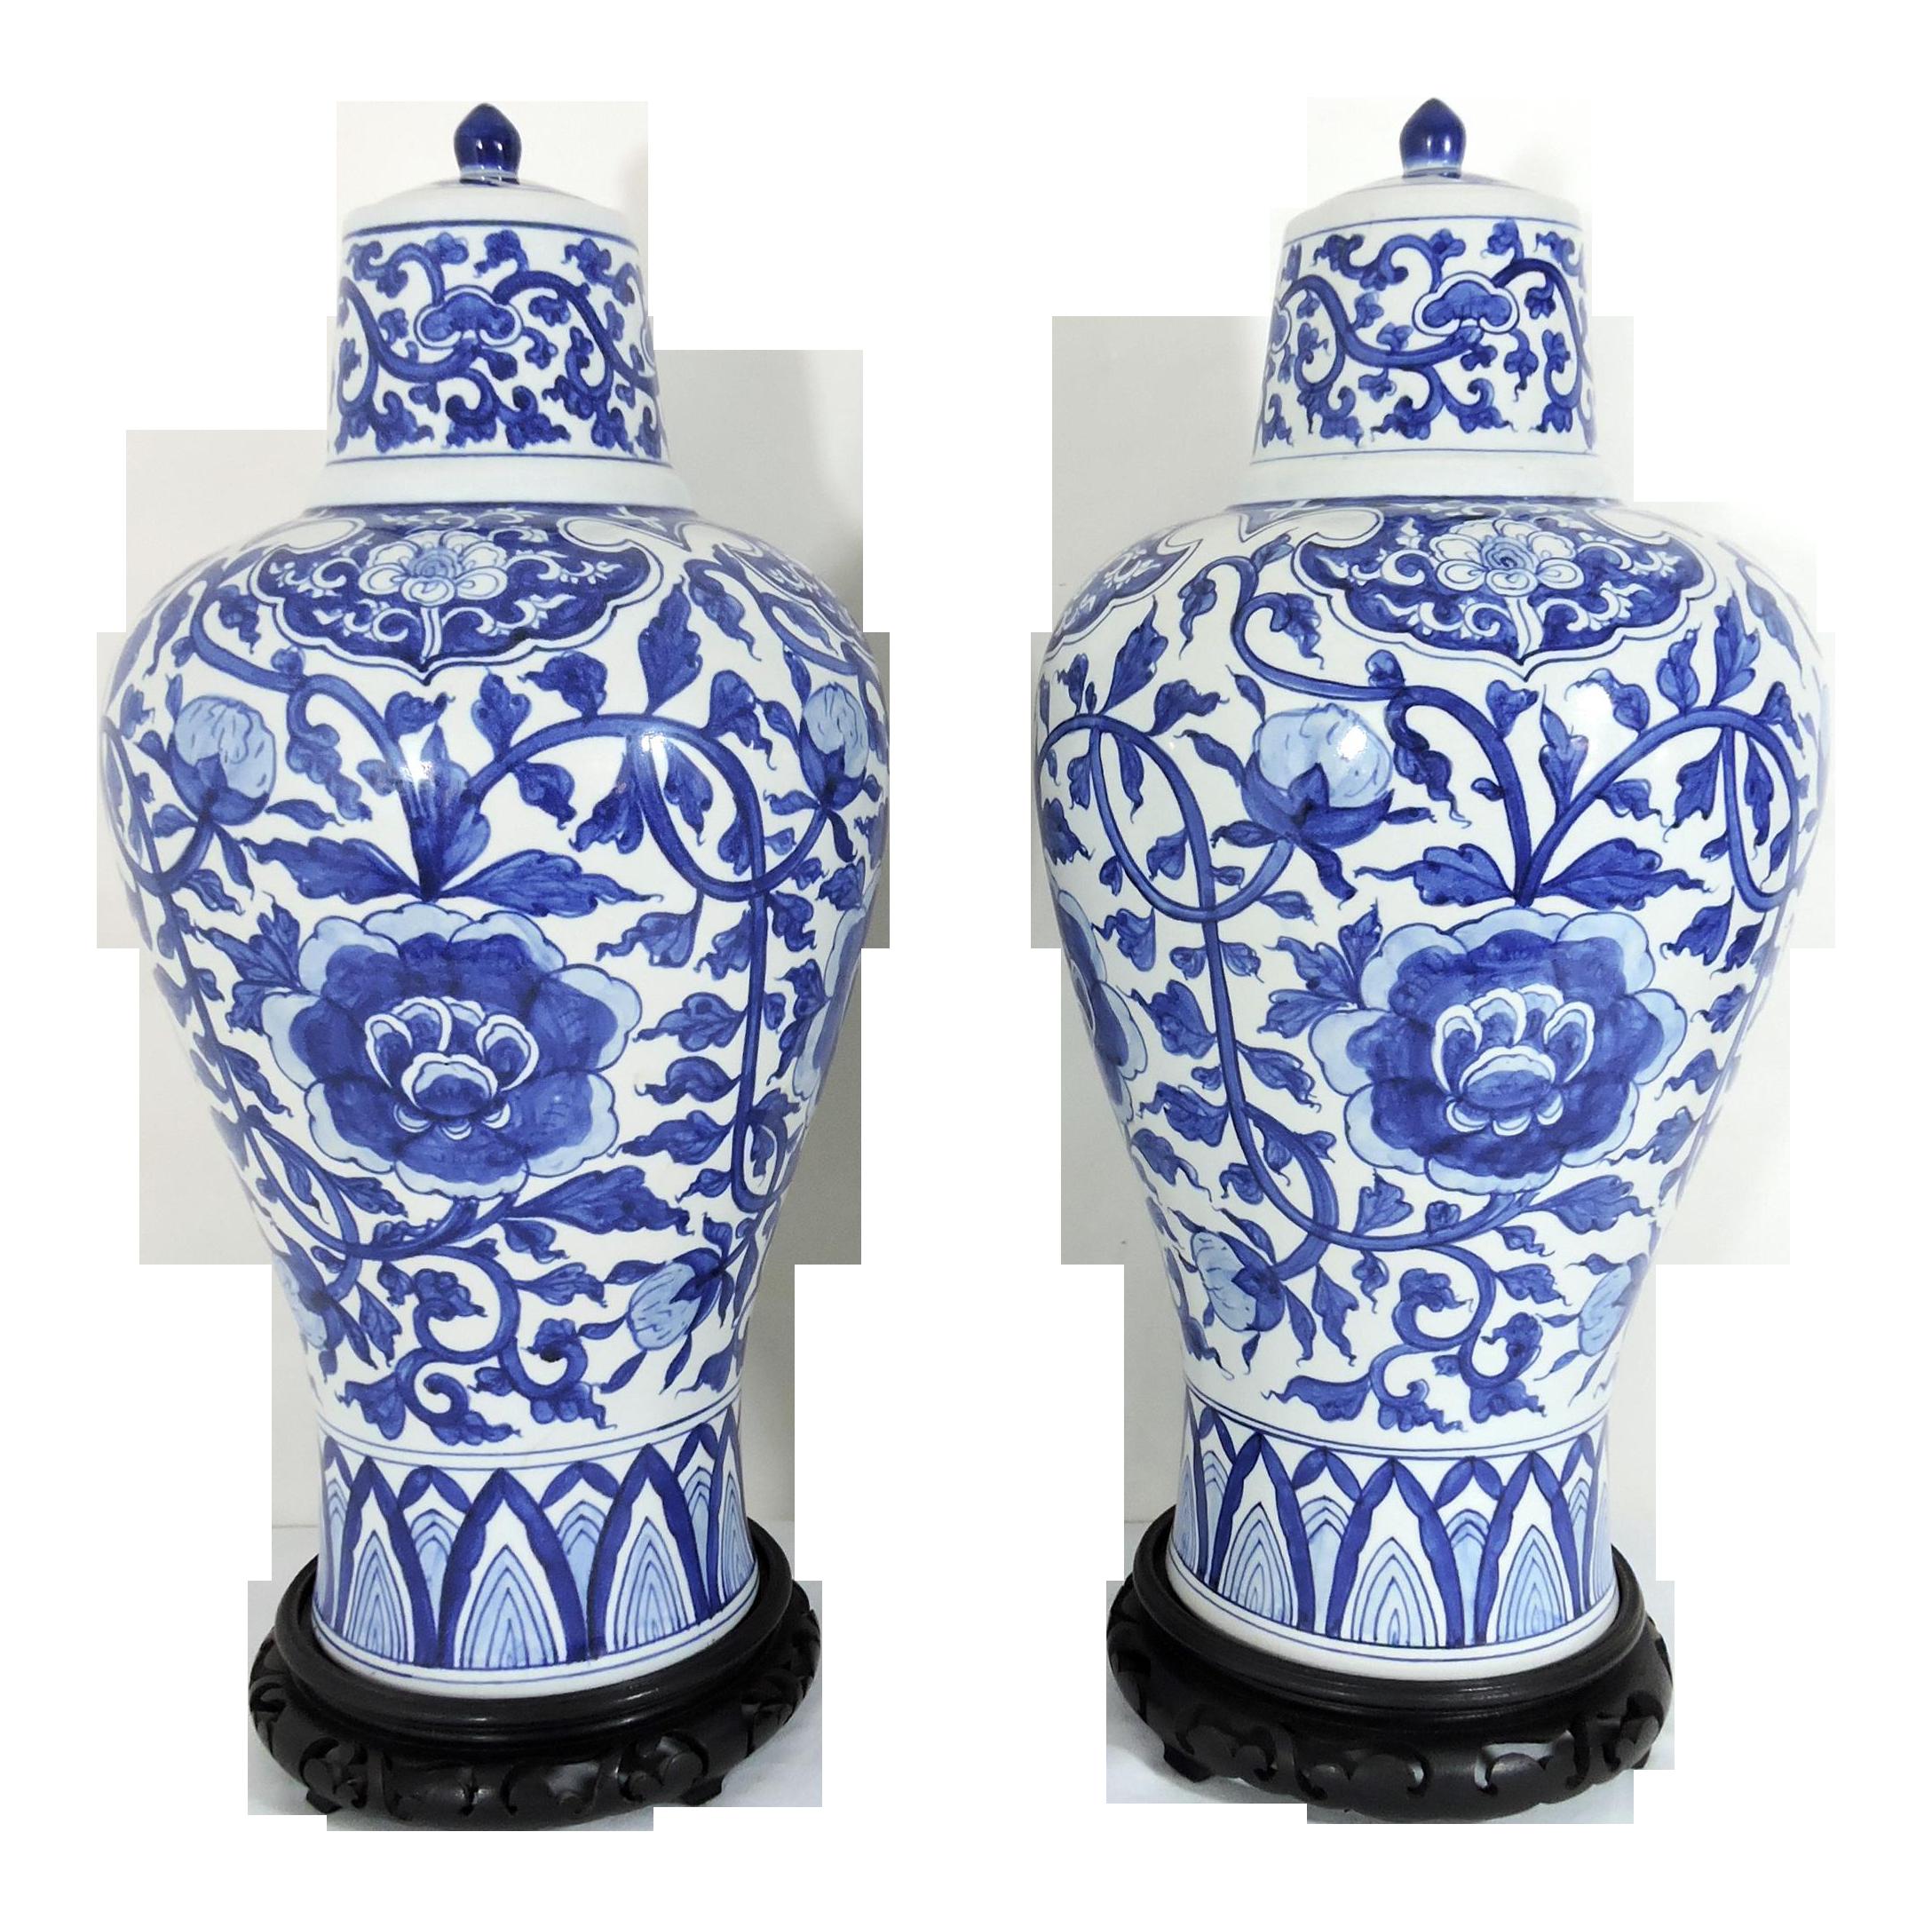 Large Vintage Chinese Blue And White Porcelain Flower Vases Urns